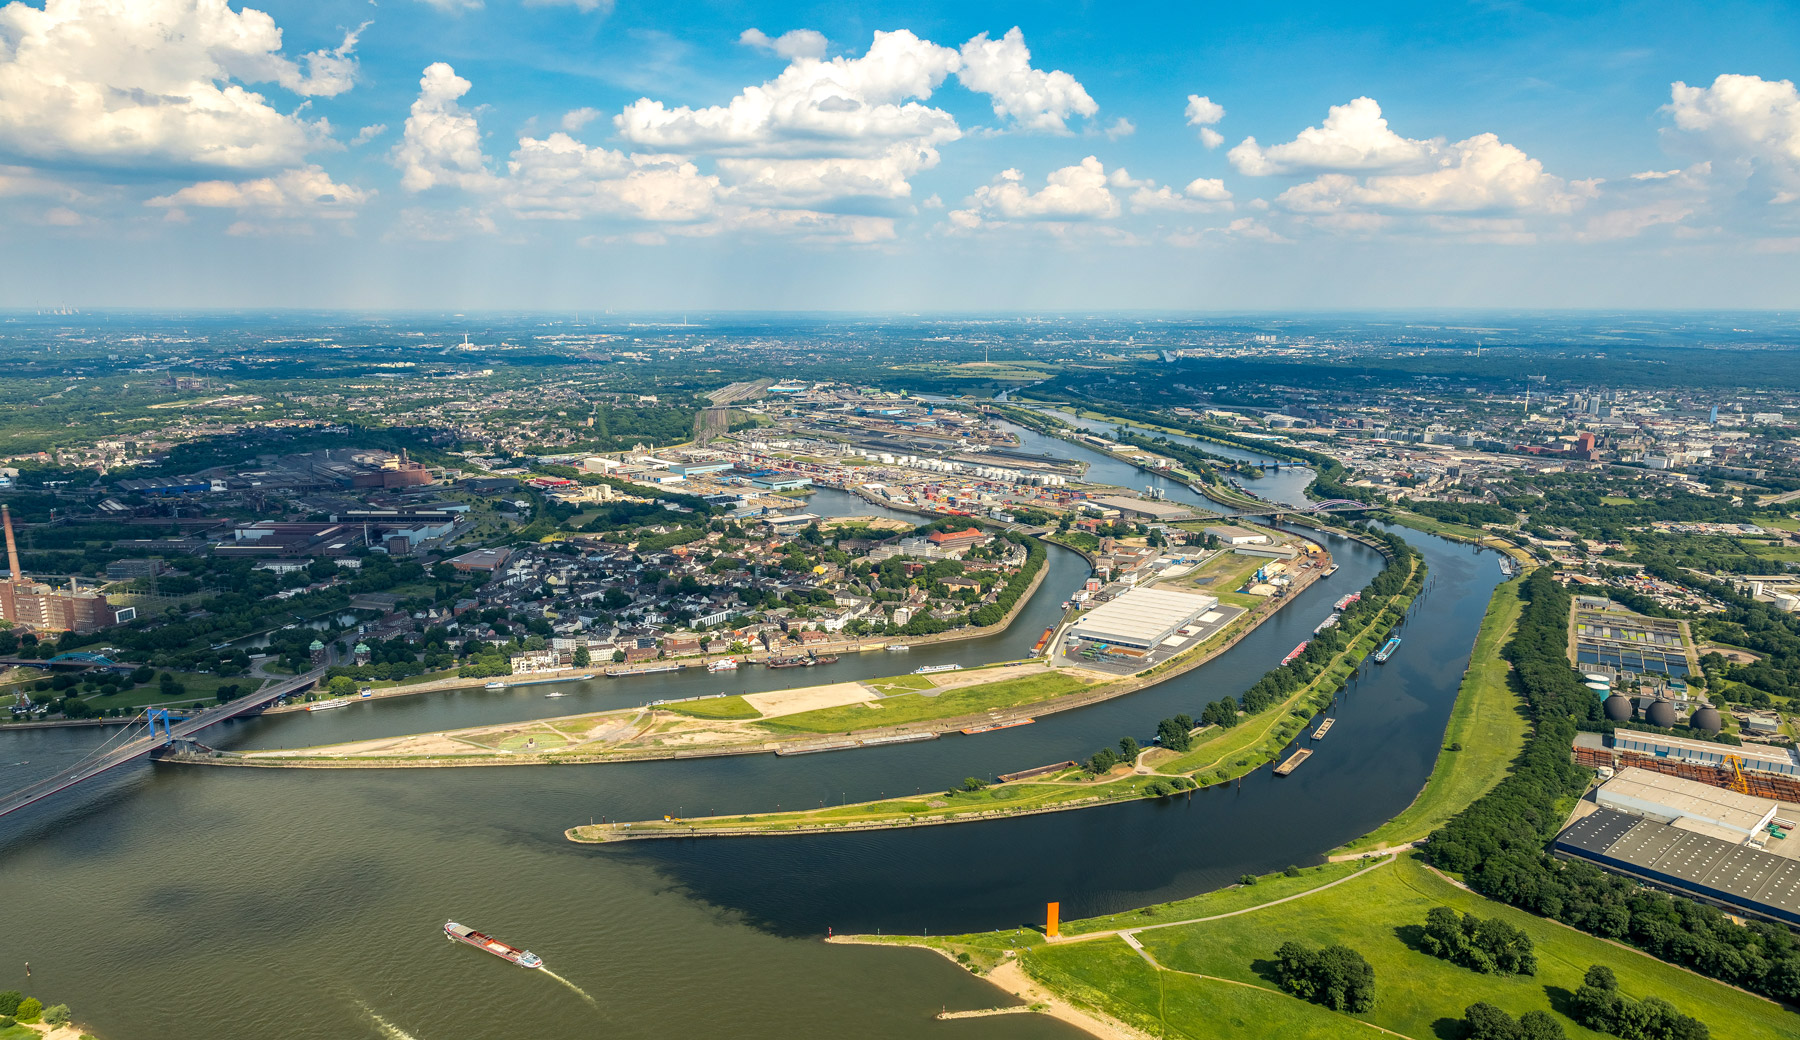 Hafen Duisburg duisport